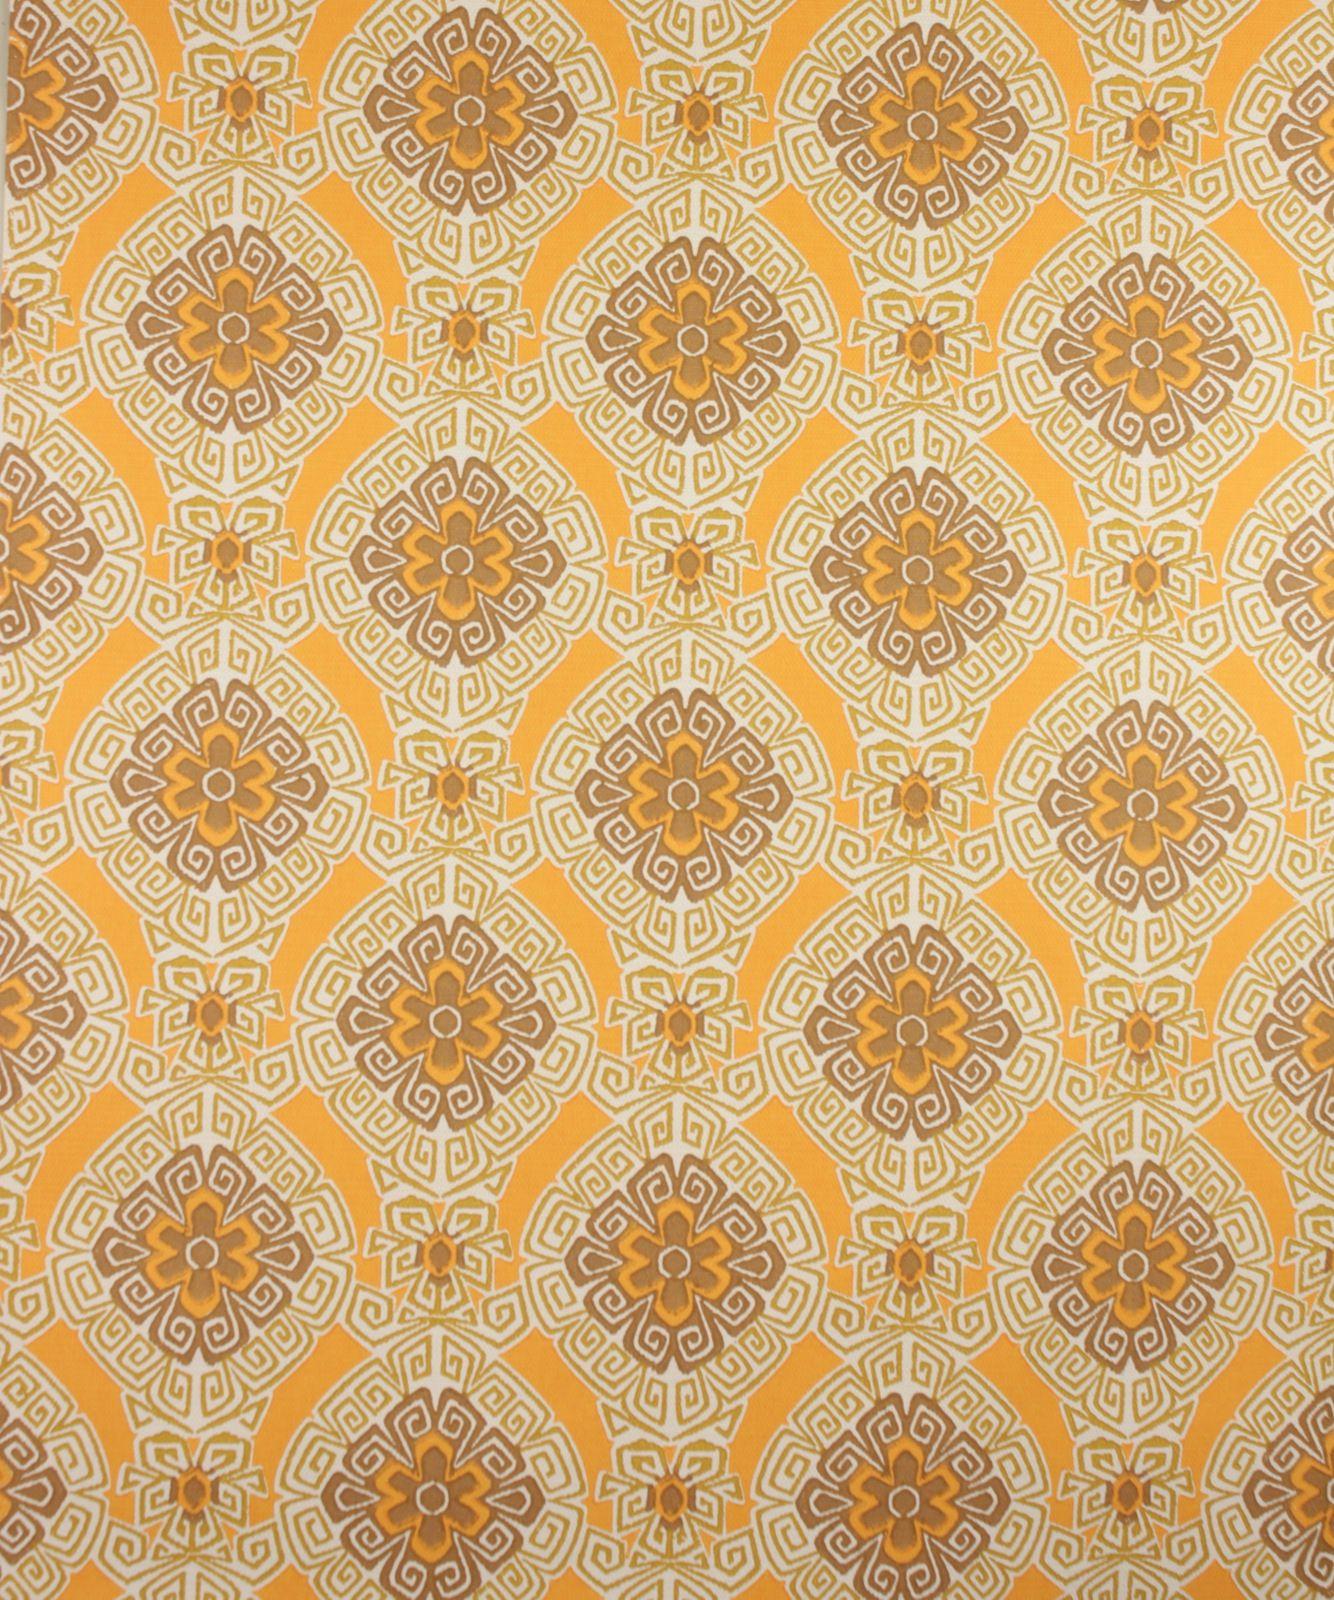 New Oranje retro behang | Swiet artikel 6654 | Wallpaper @YY12